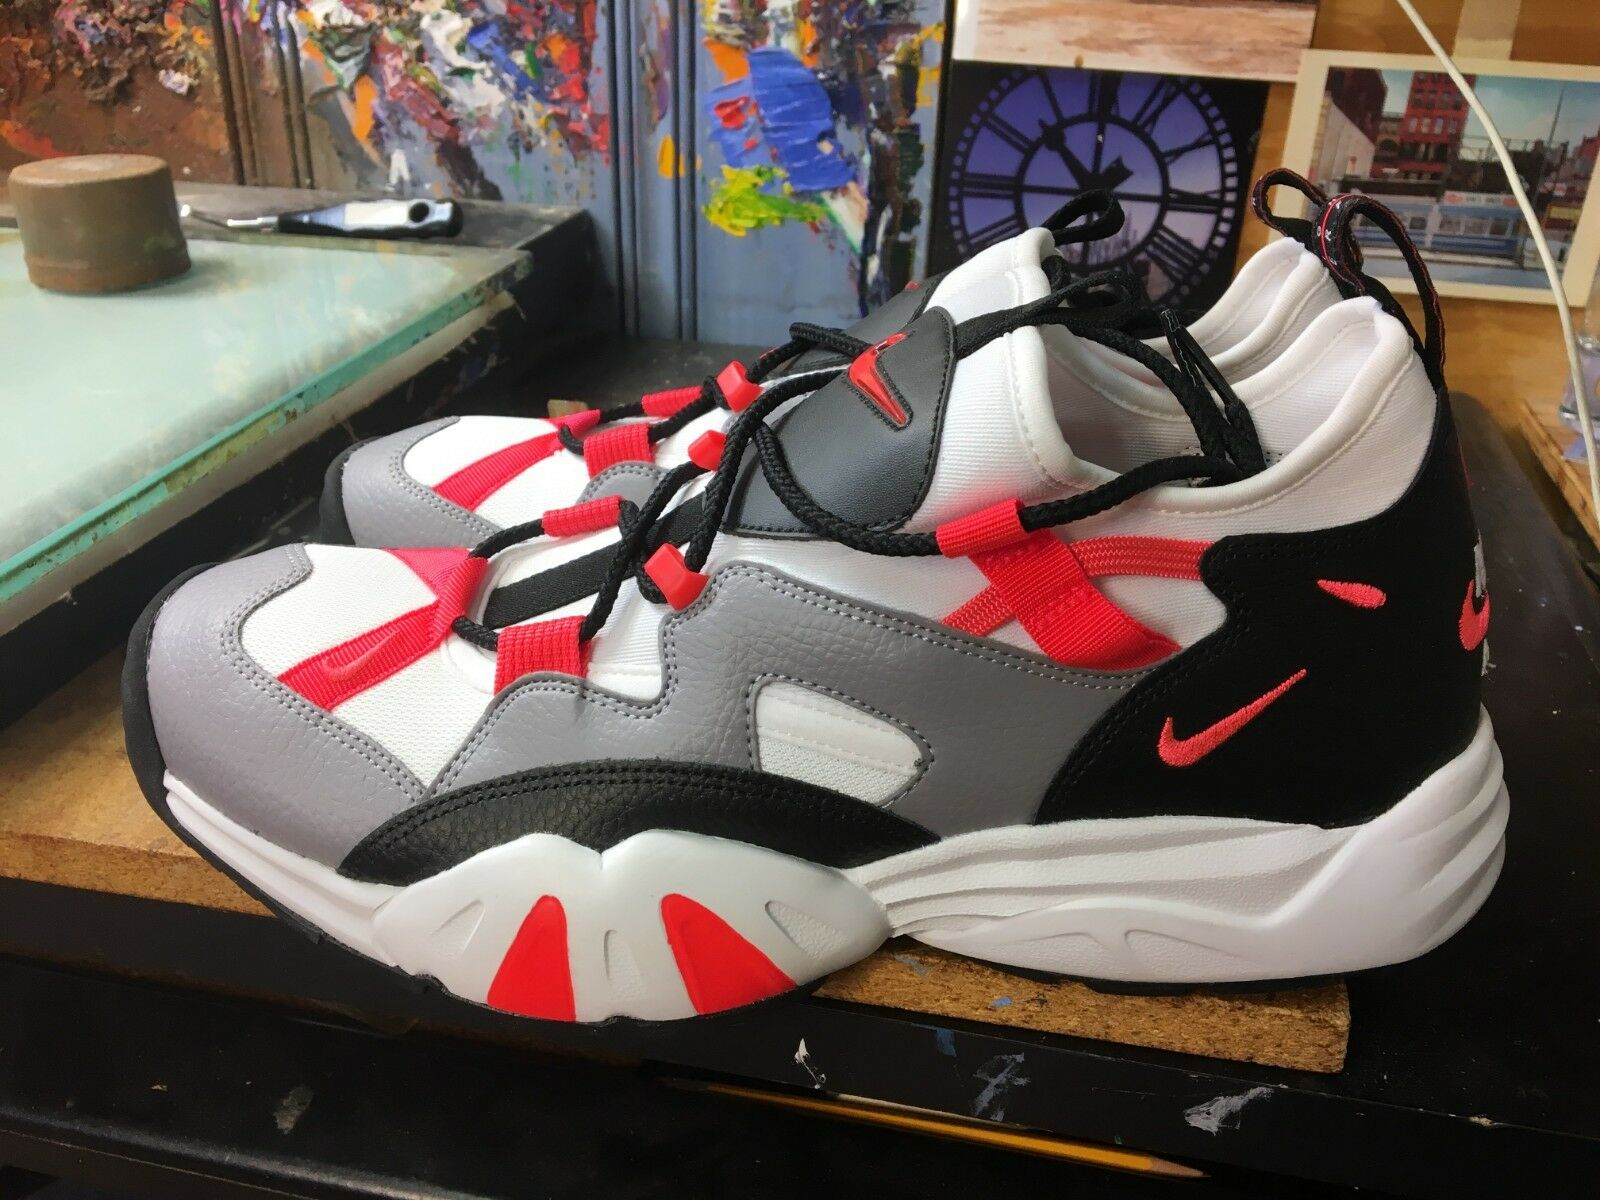 Nike air schreien lwp zement grau / schwarz - größe ah8517 11,5 männer ah8517 größe 002 be76db